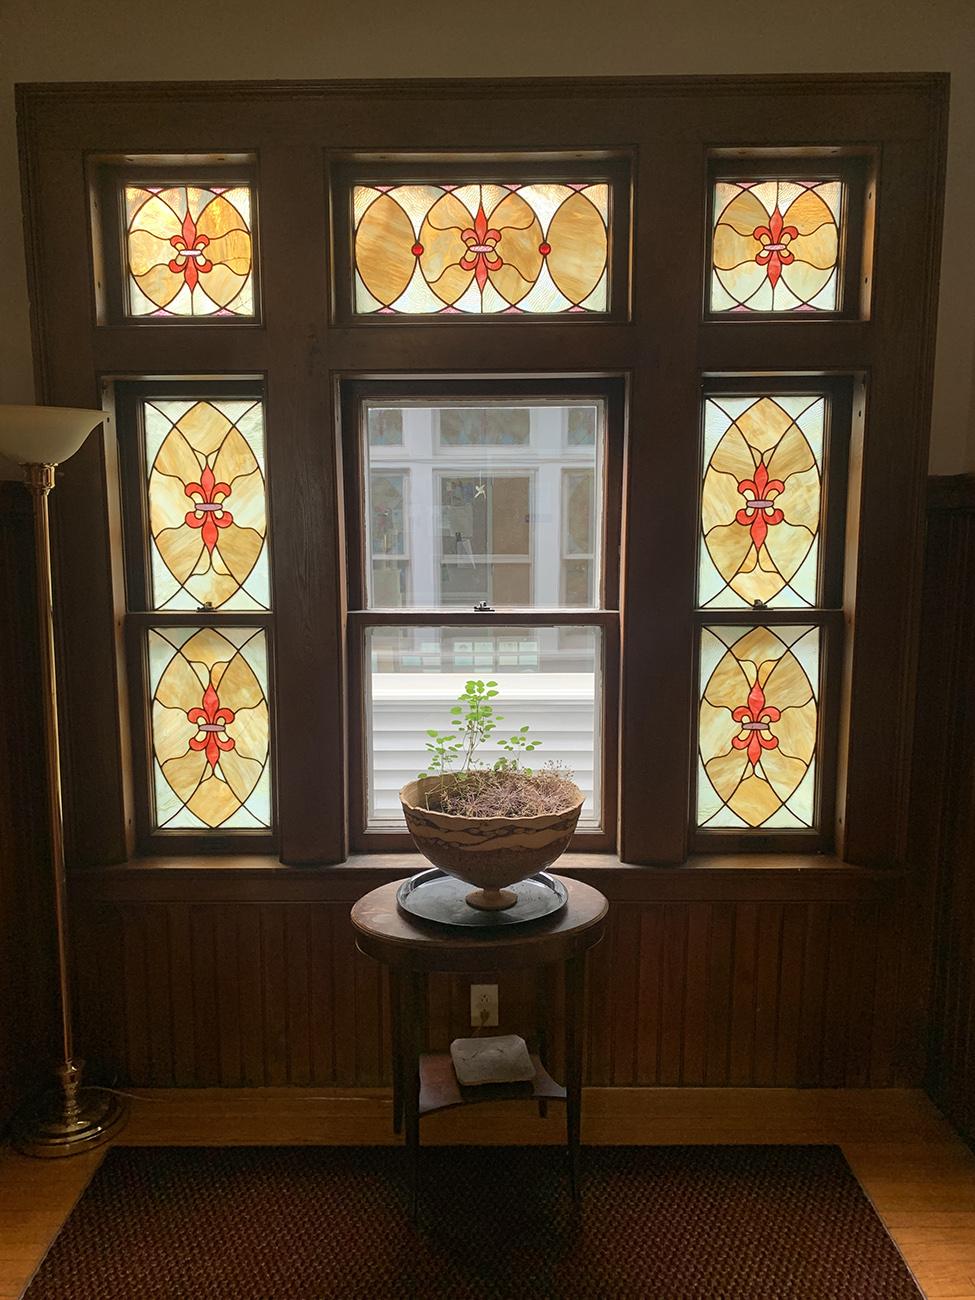 HFI Interior decorative windows